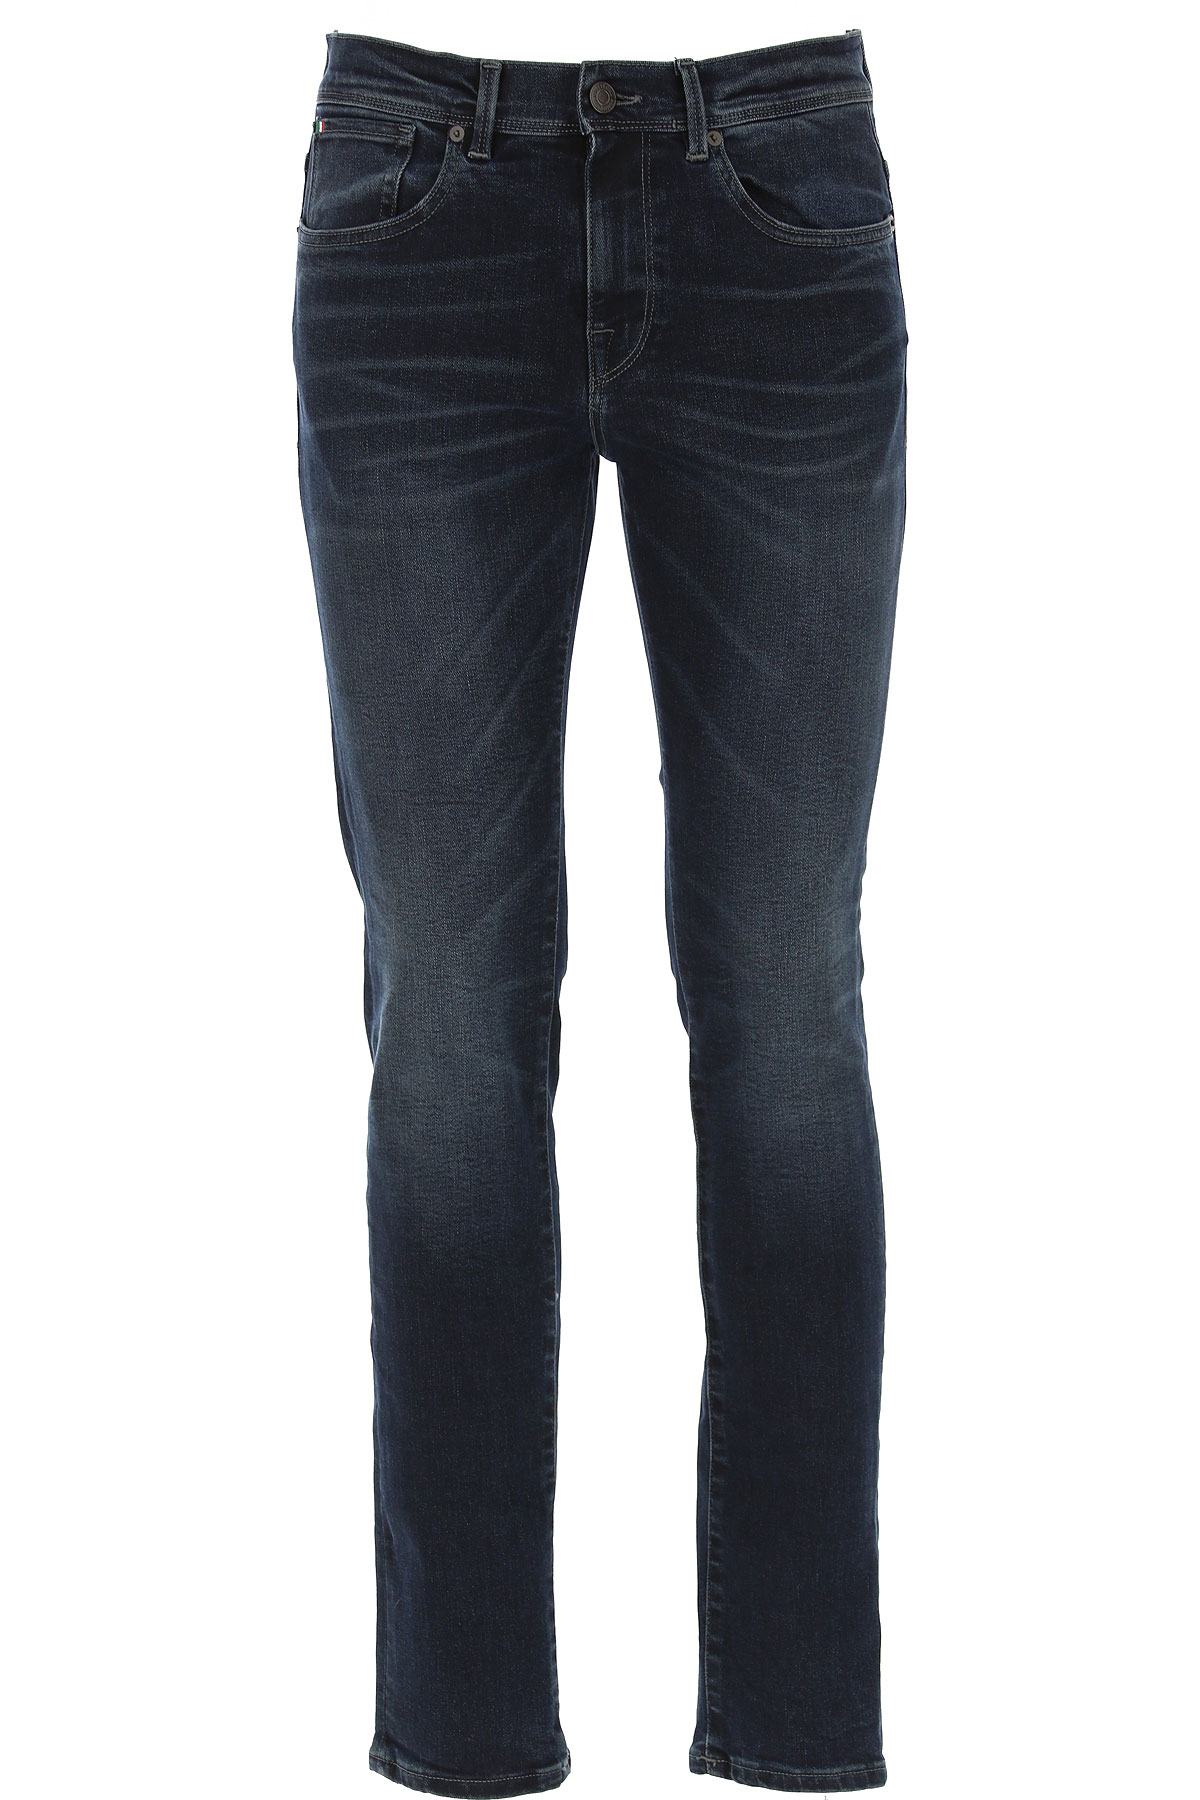 Selected Jeans On Sale, Denim, Cotton, 2019, 29 30 31 32 33 34 35